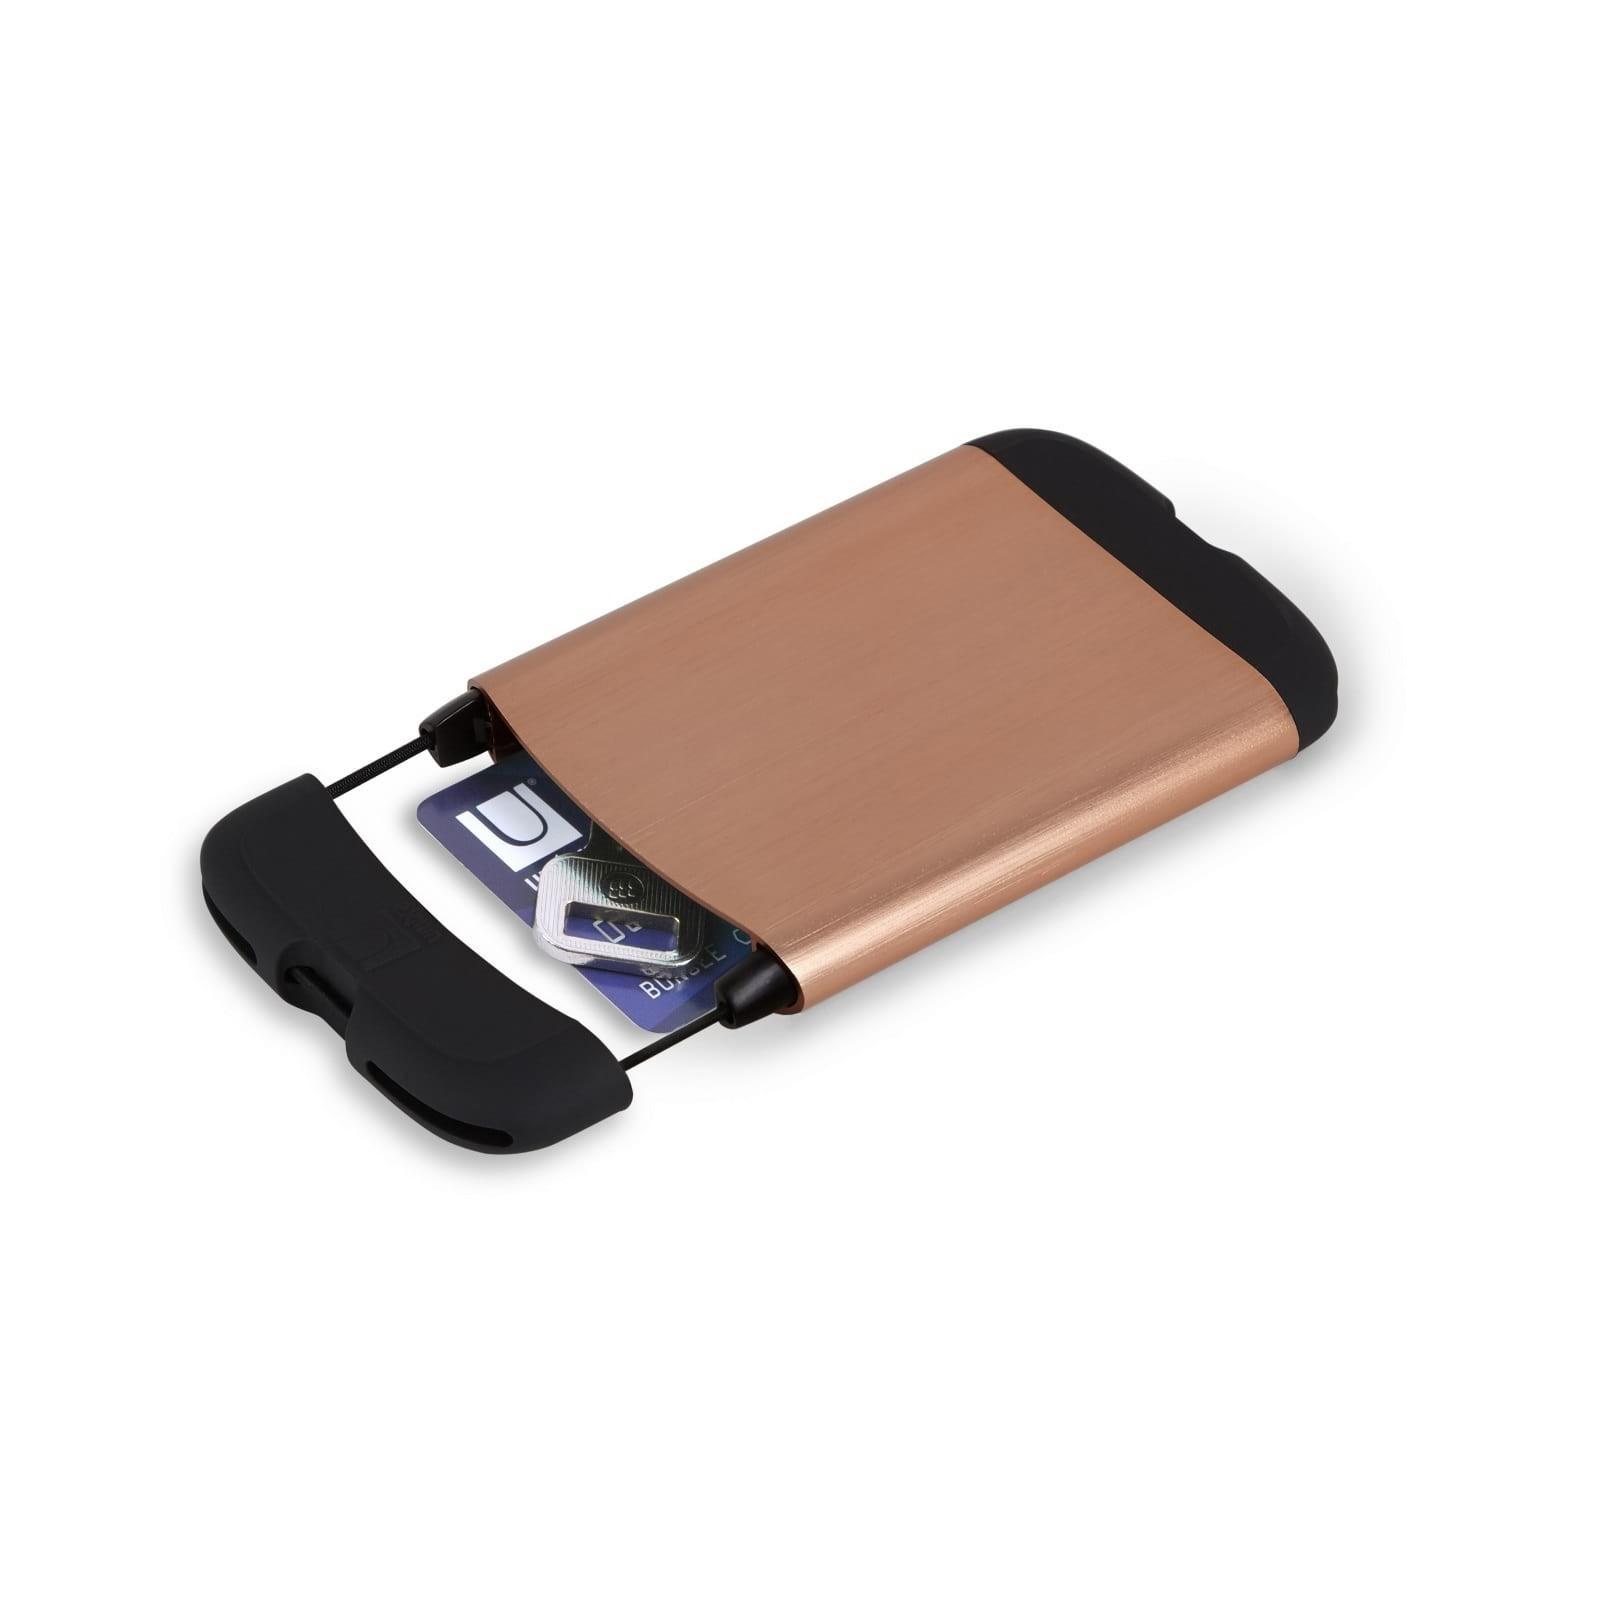 Bungee RFID-Blocking Card Holder Wallet (Copper) - Umbra